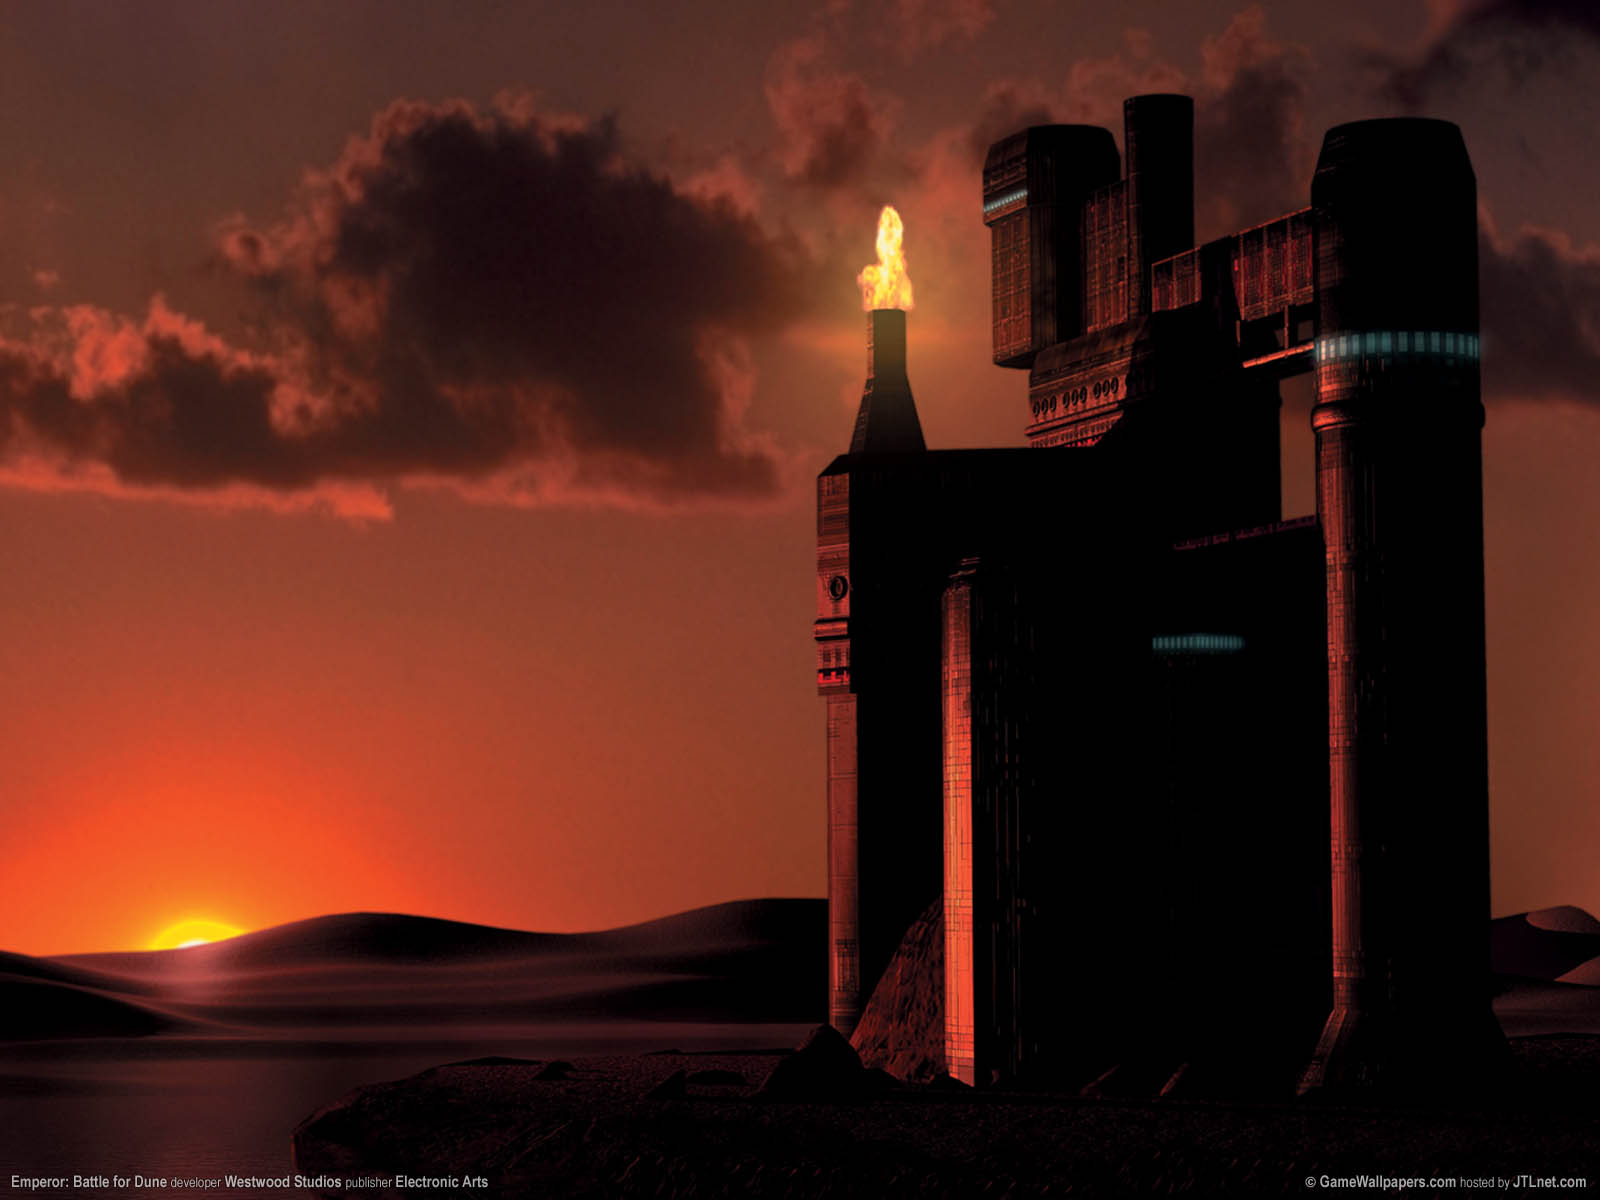 Emperor: Battle for Dune wallpaper 01 1600x1200